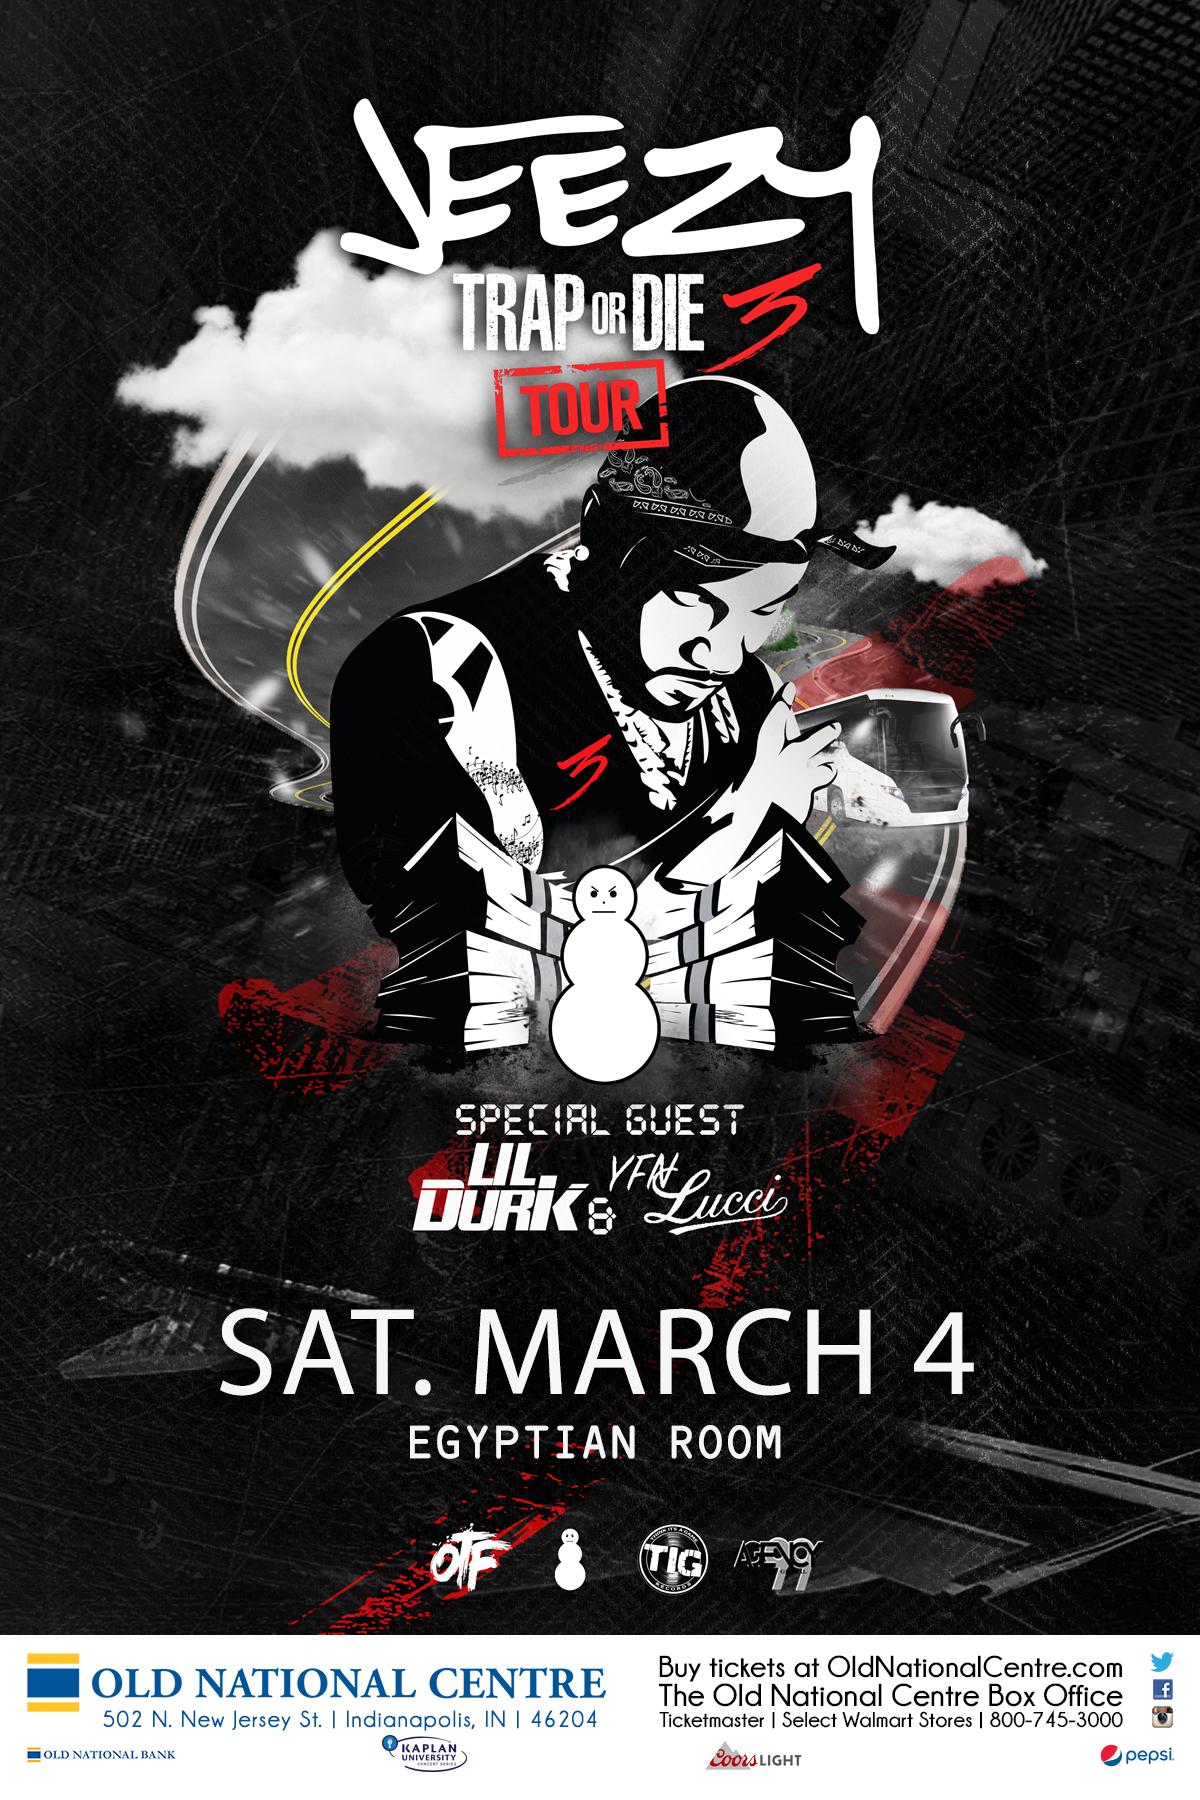 Jeezy Trap or Die 3 Tour